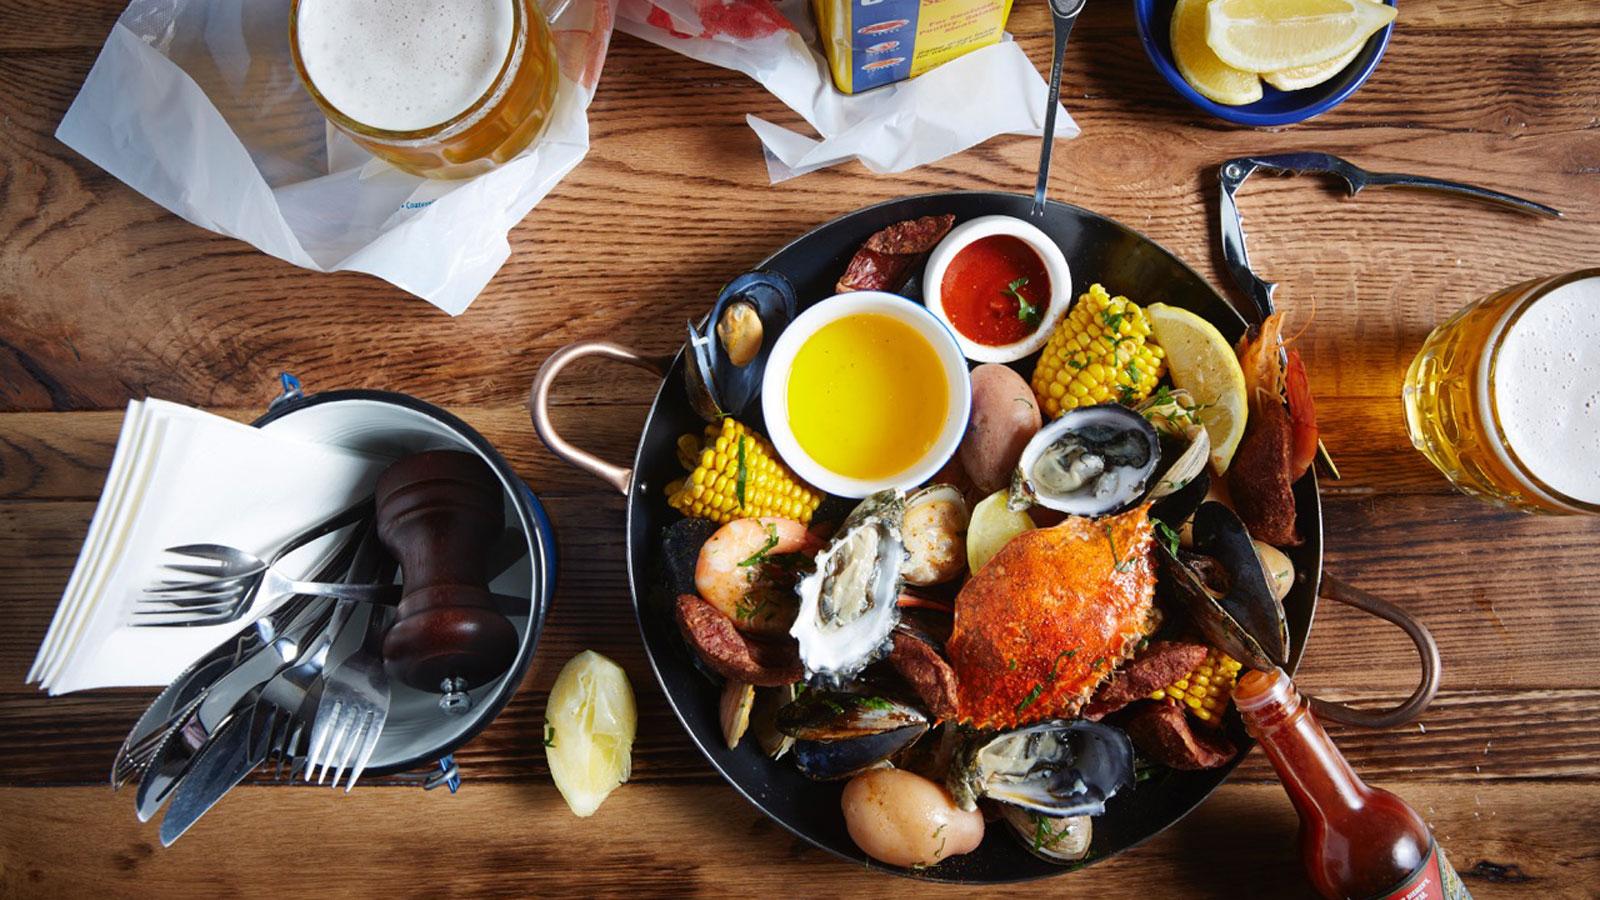 Miss Katie's Crab Shack, Melbourne, Victoria, Australia